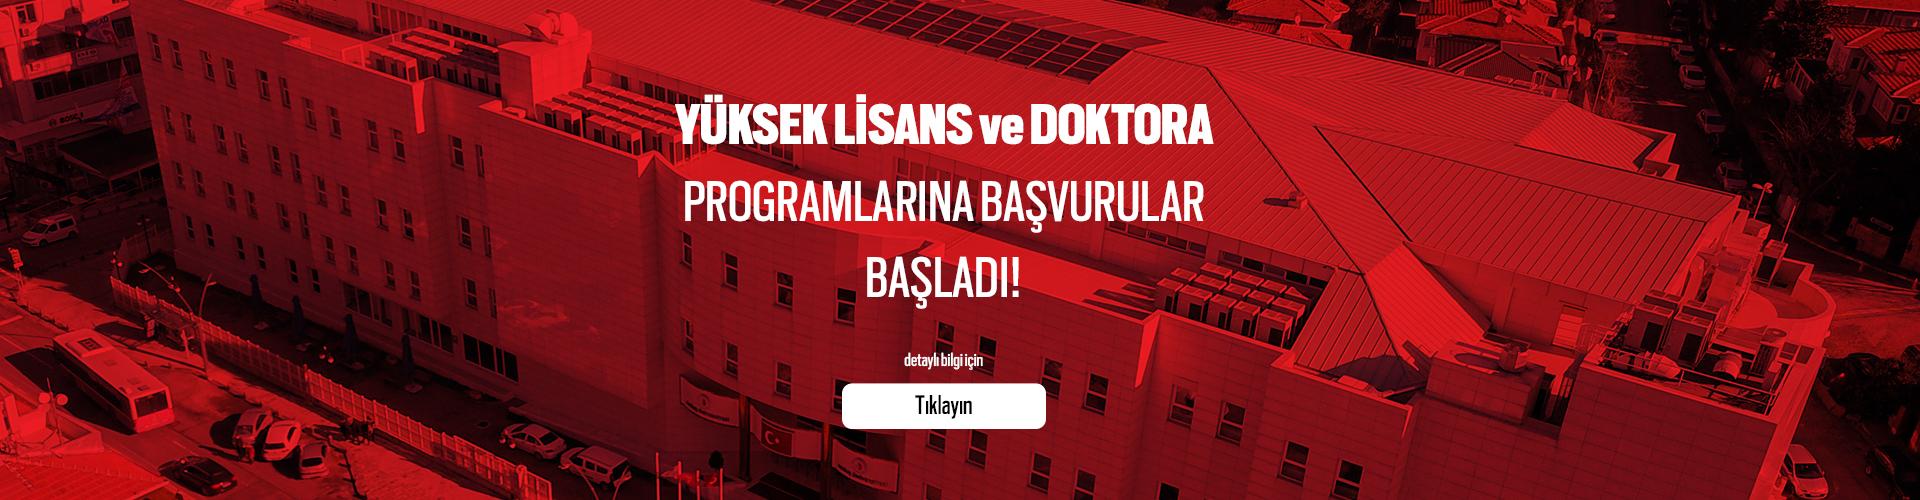 YüksekLisans_Doktora_1920x500